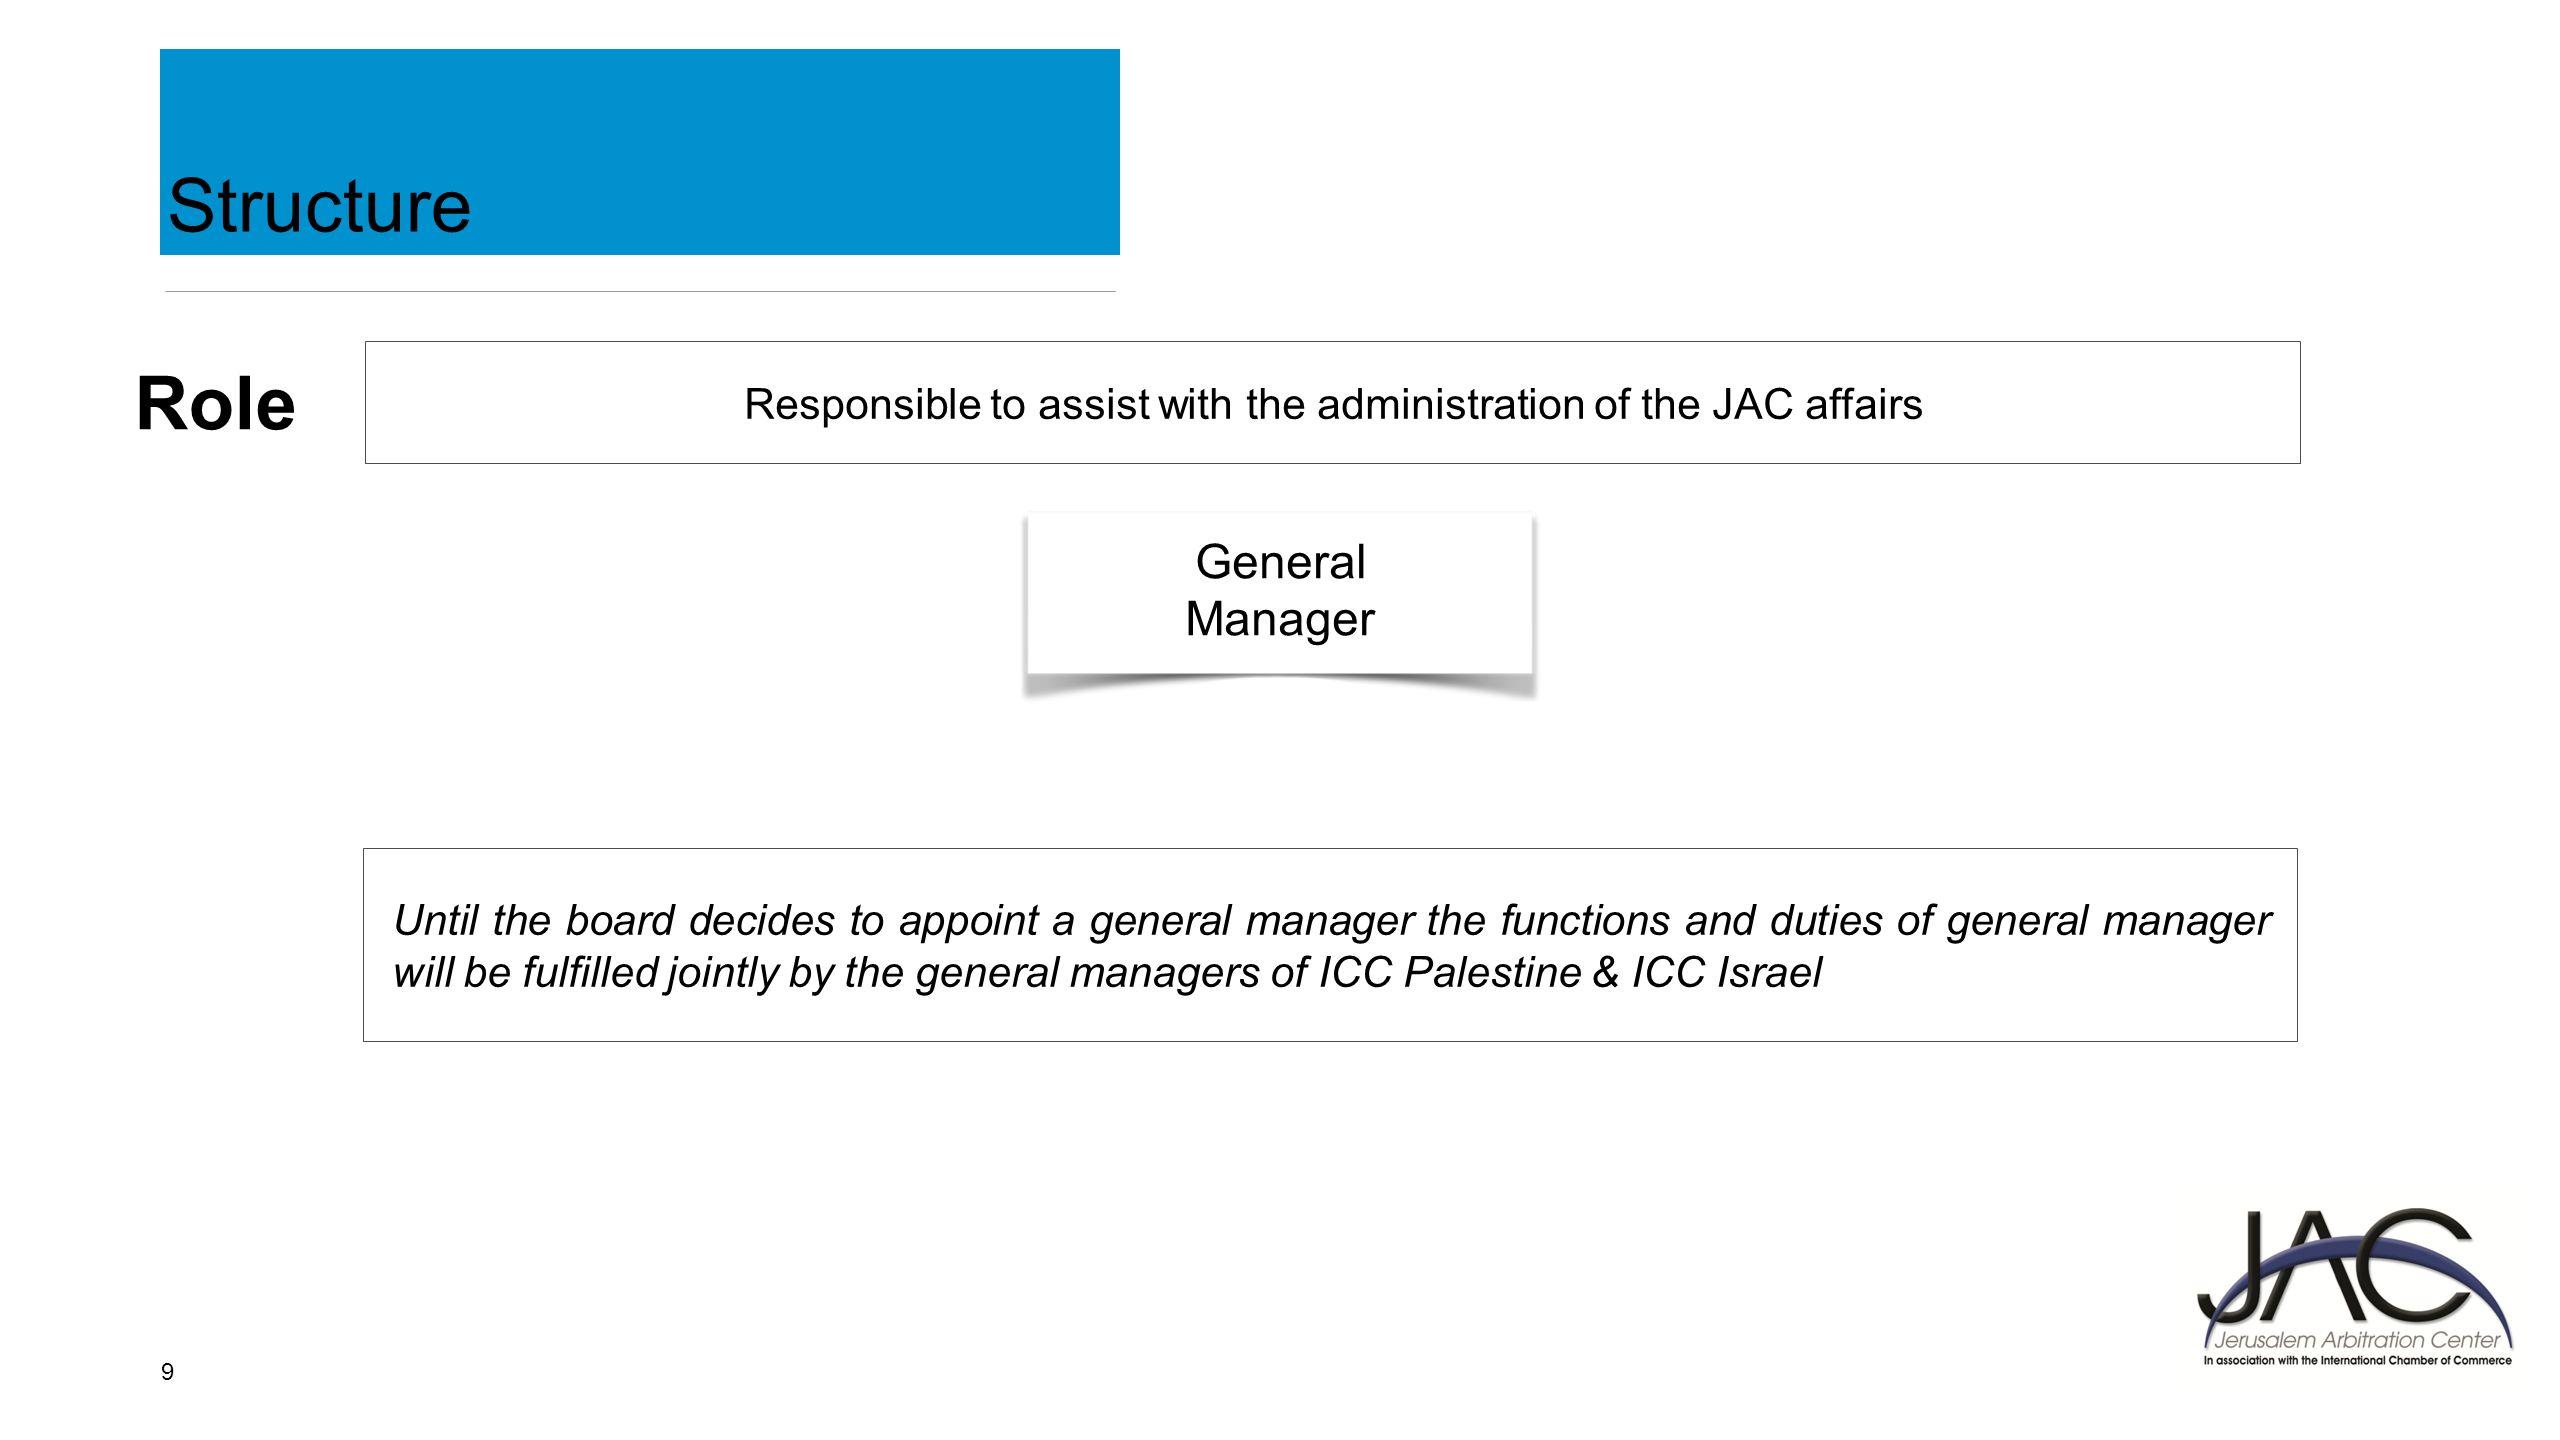 1 Jerusalem Arbitration Center 2 A Non Profit Joint Venture Between Icc Wiring Diagram 9 Structure